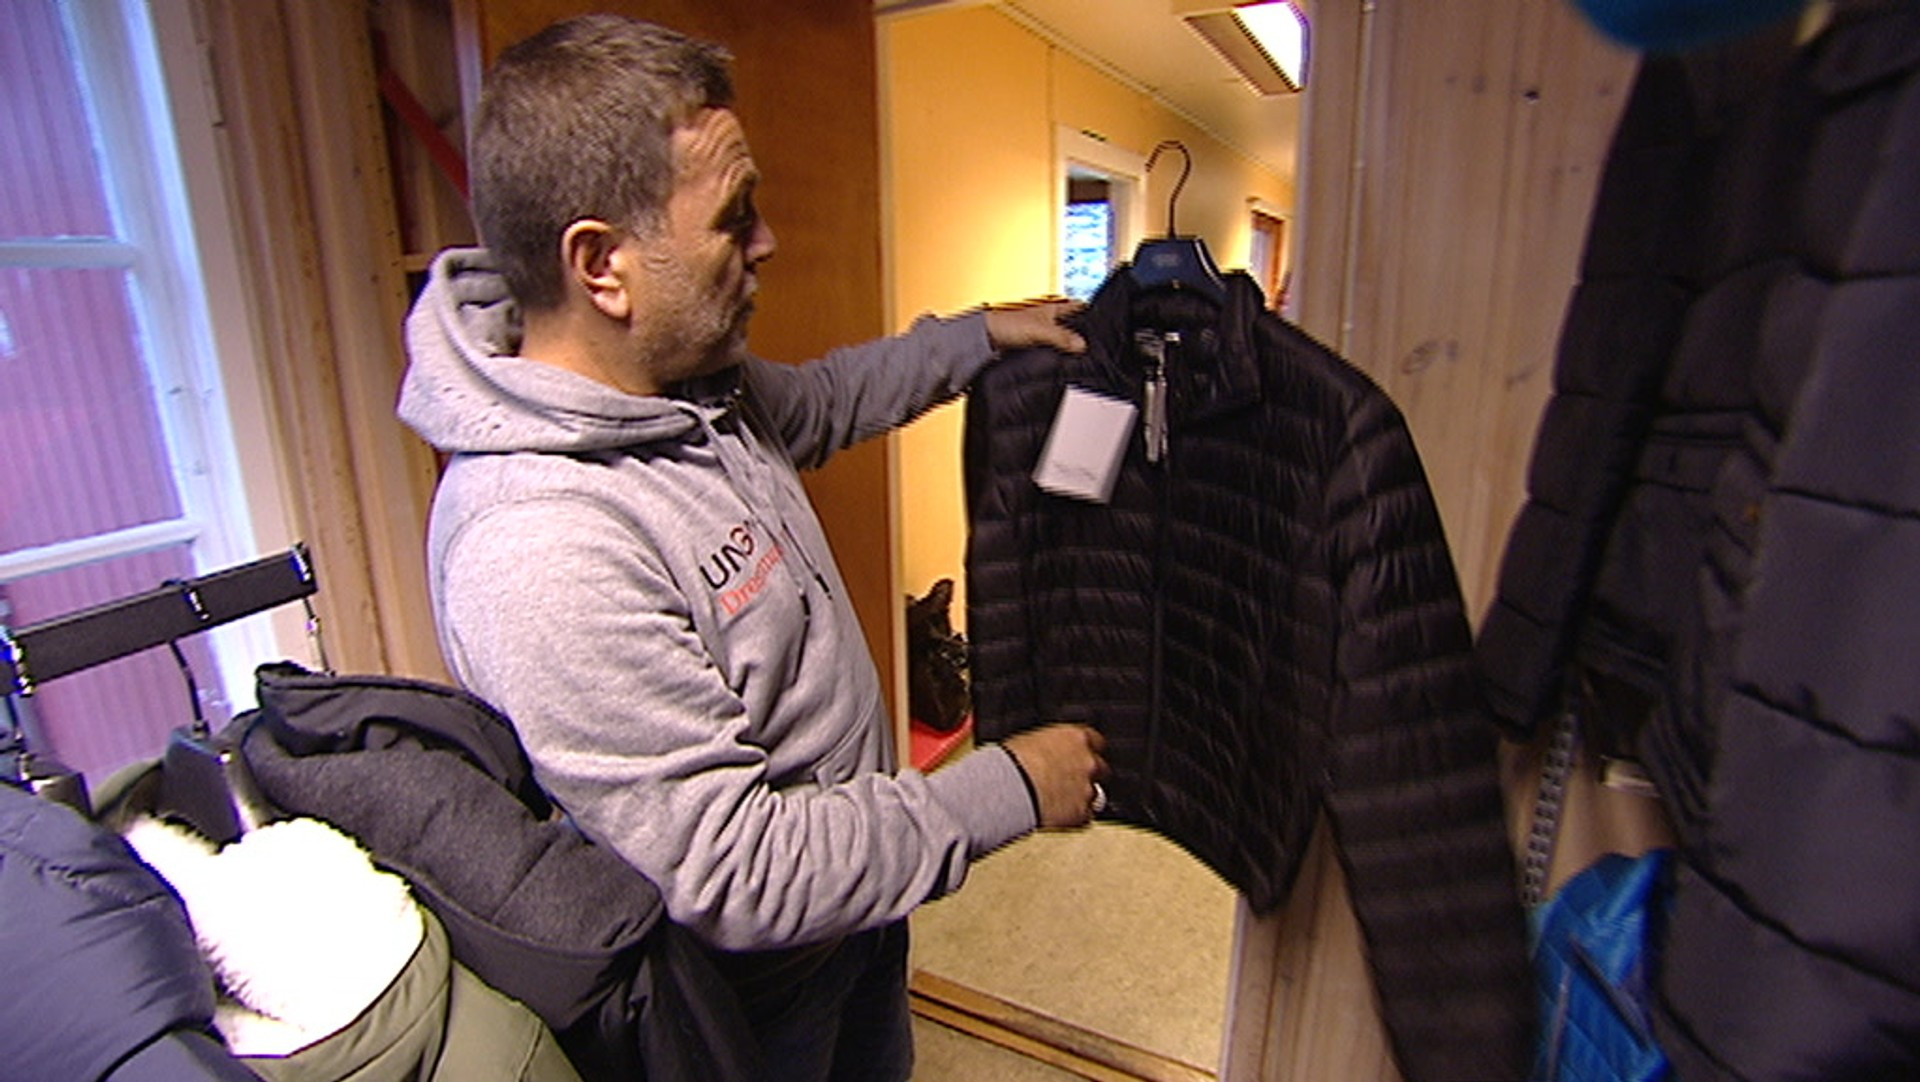 470f8a5e Gir bort klær til barnevernsbarn – Video